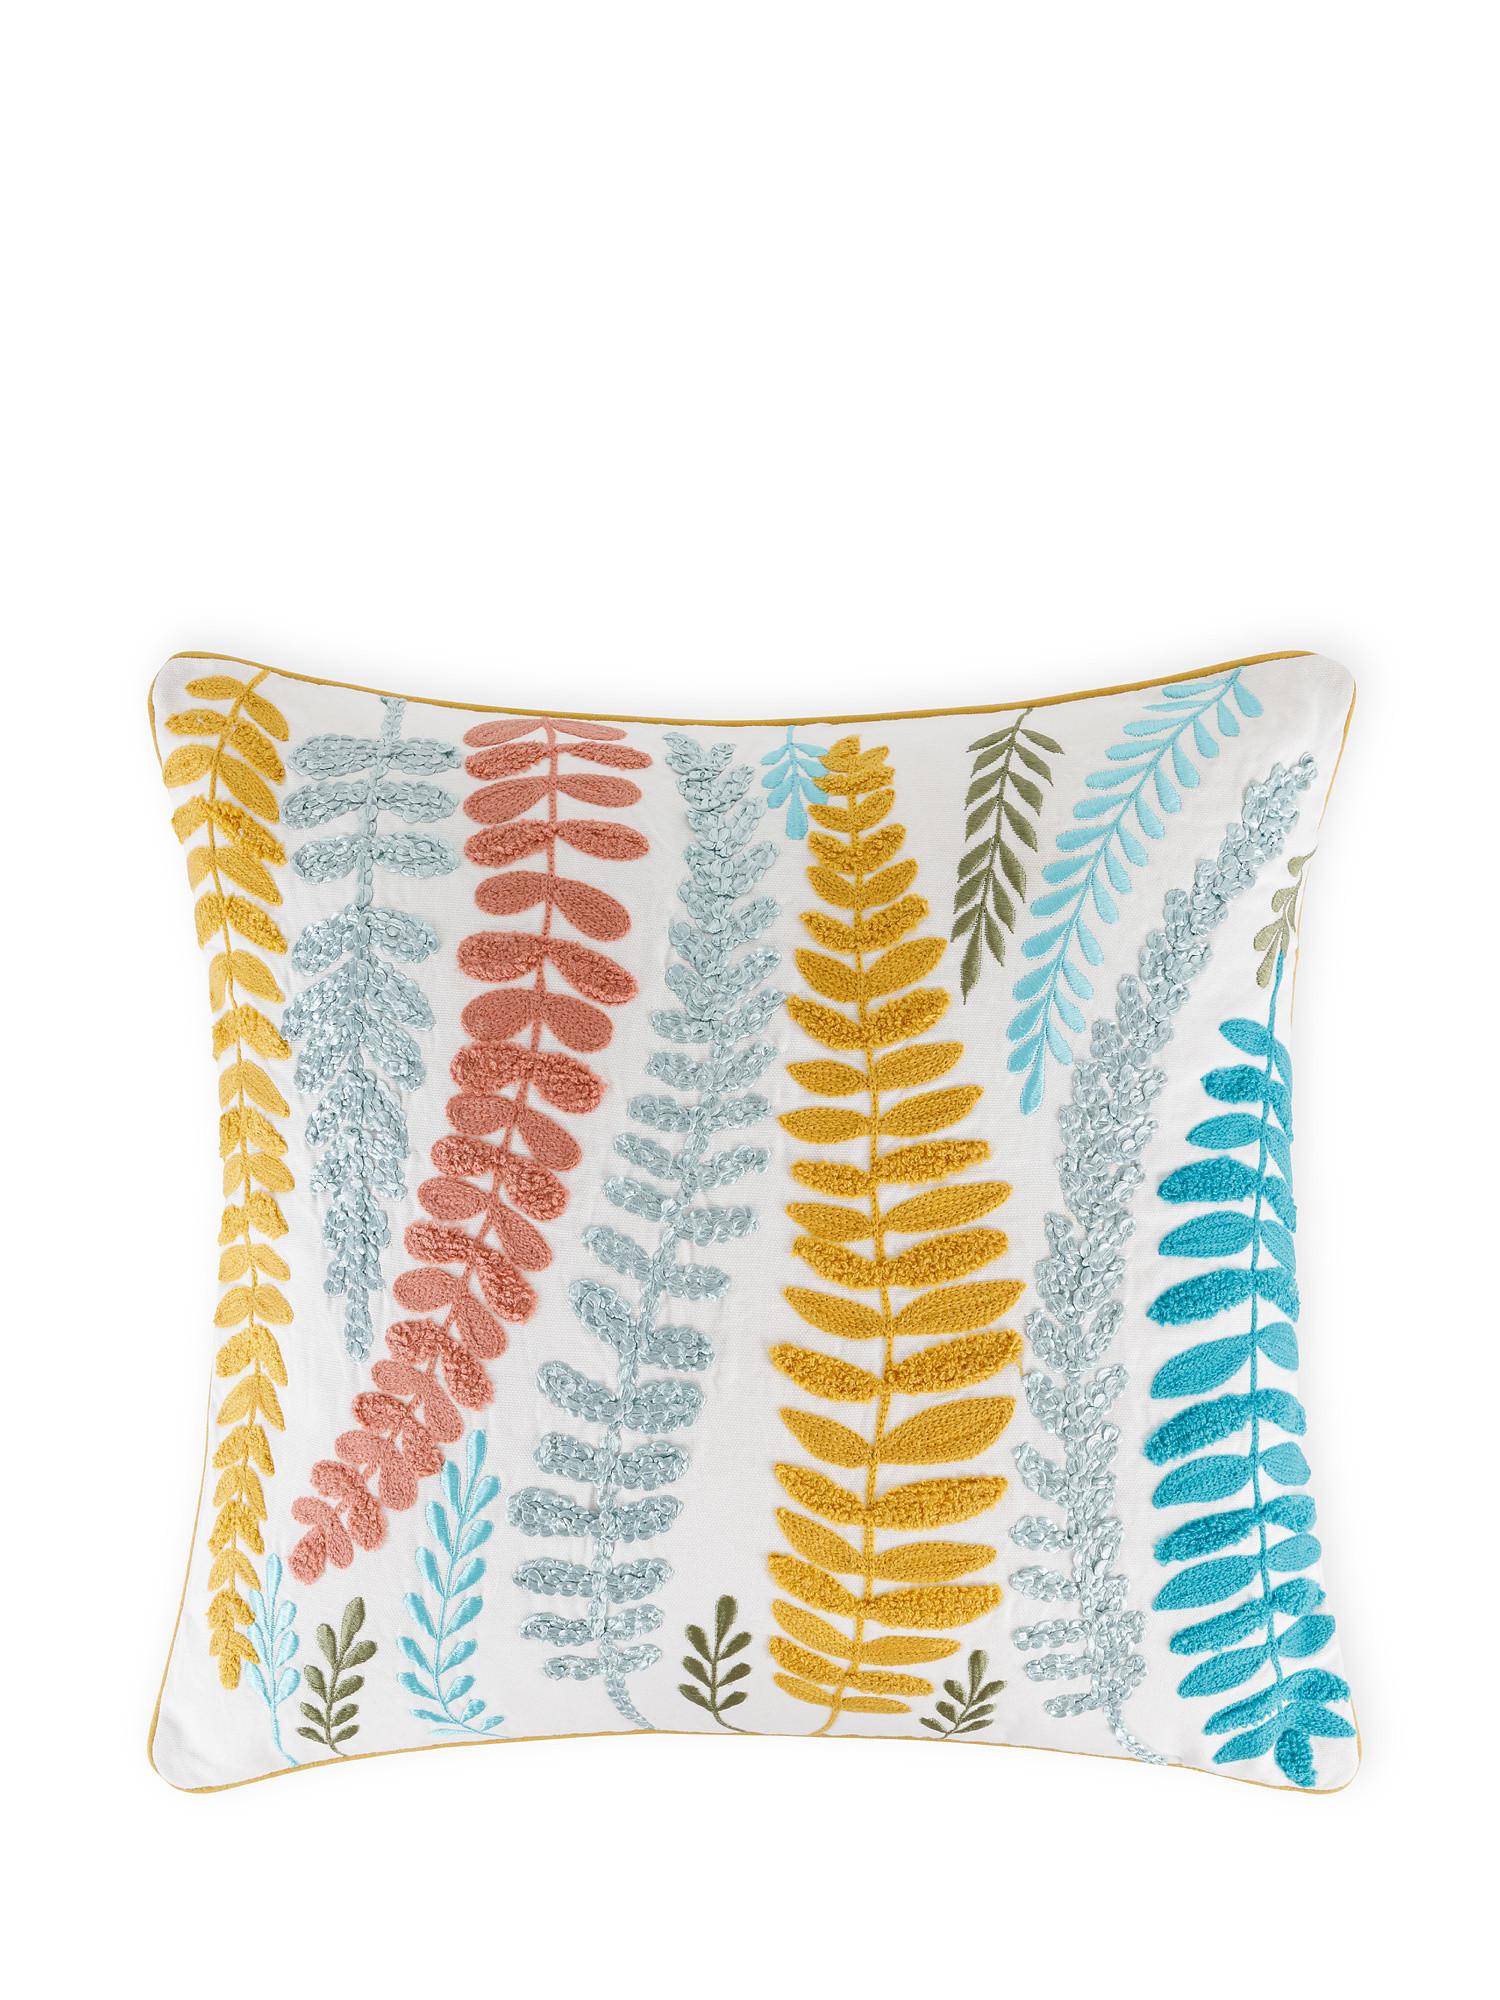 Cuscino cotone ricamo foglie 45x45cm, Multicolor, large image number 0